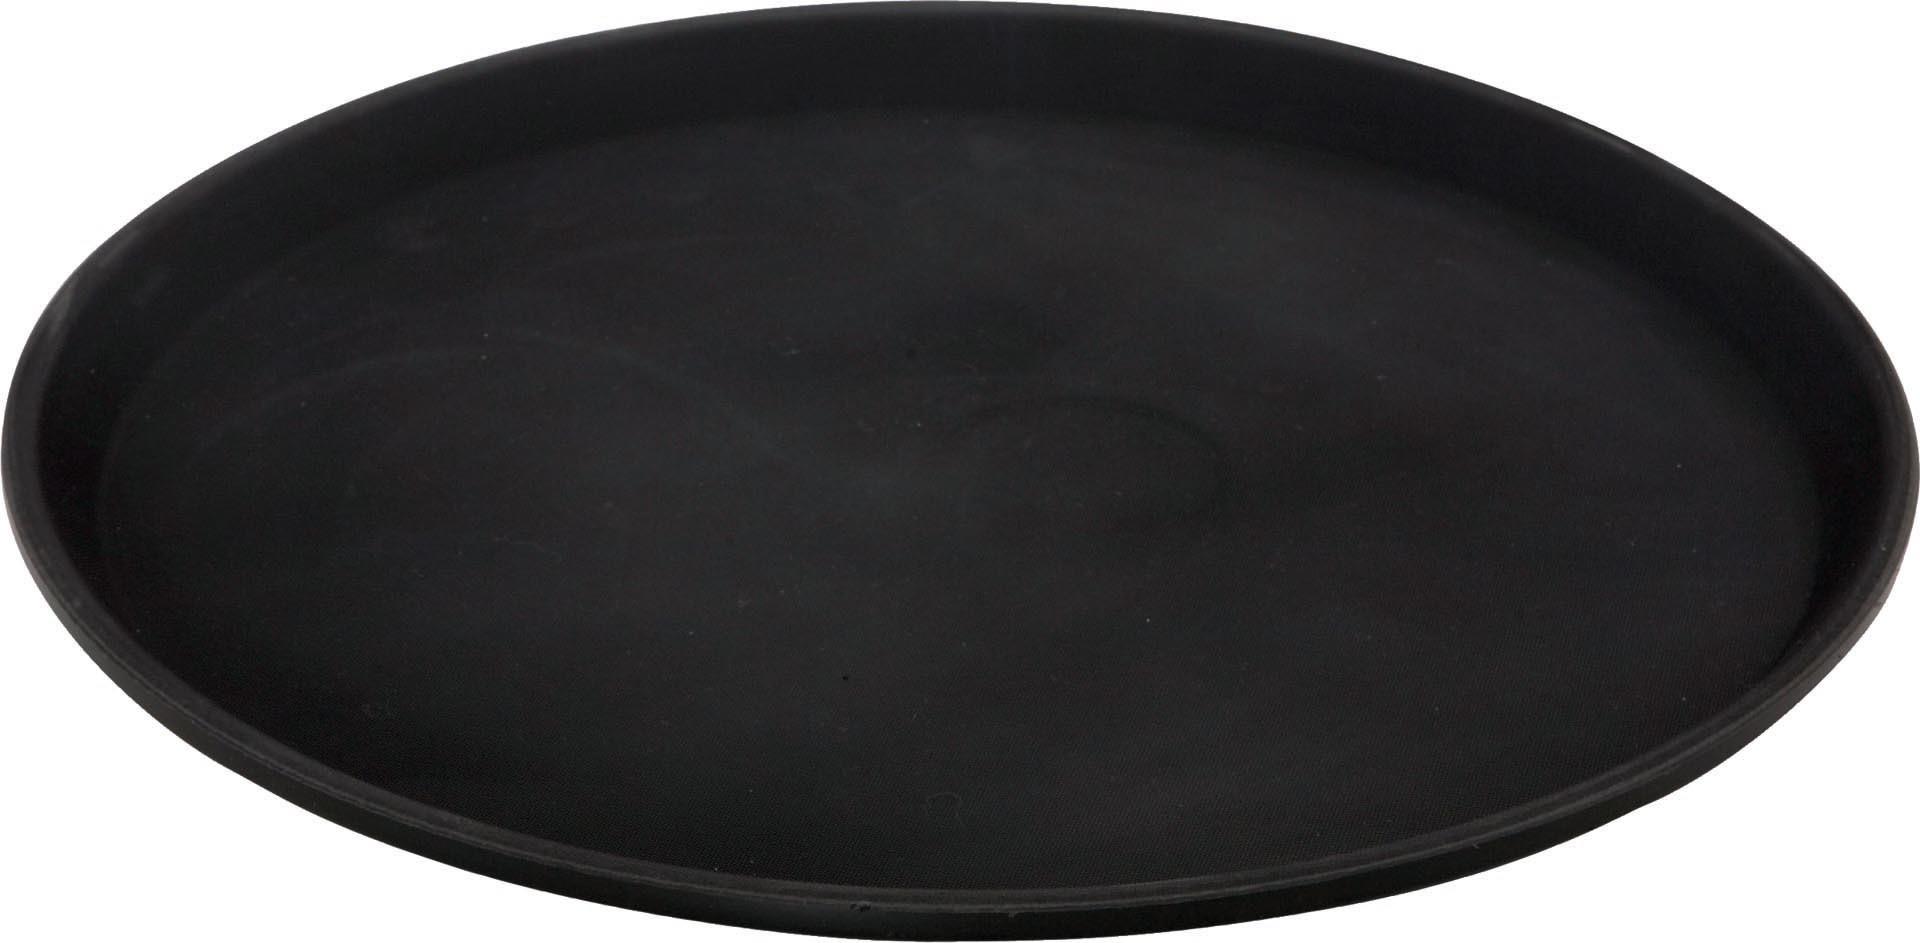 Serviertablett Orig. American 28 cm